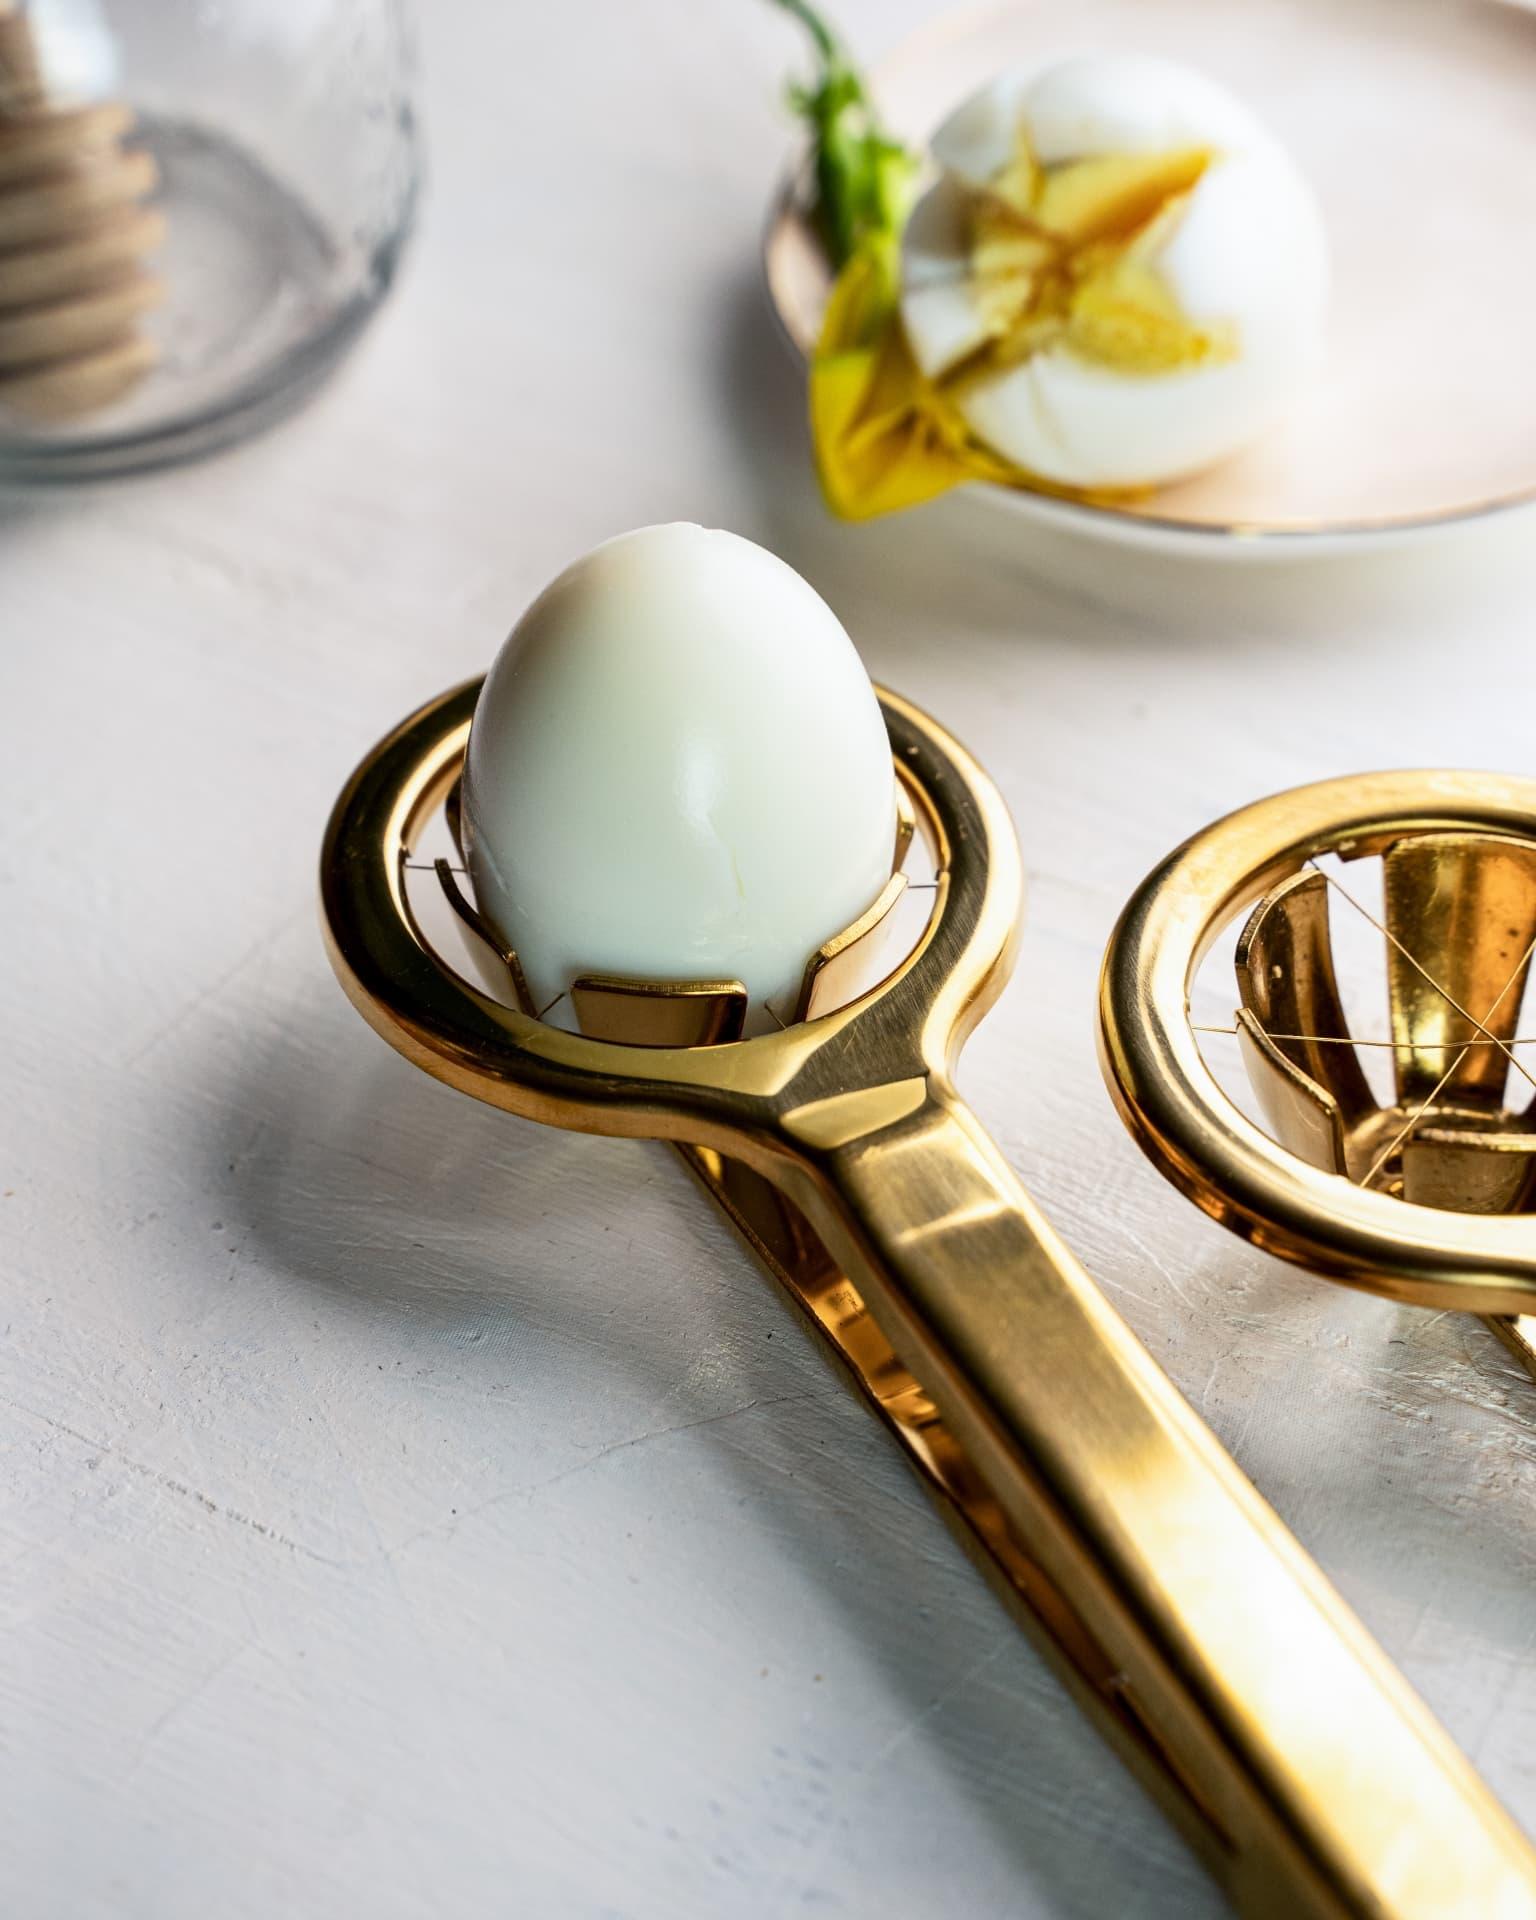 Viola OneQuest Egg Tool